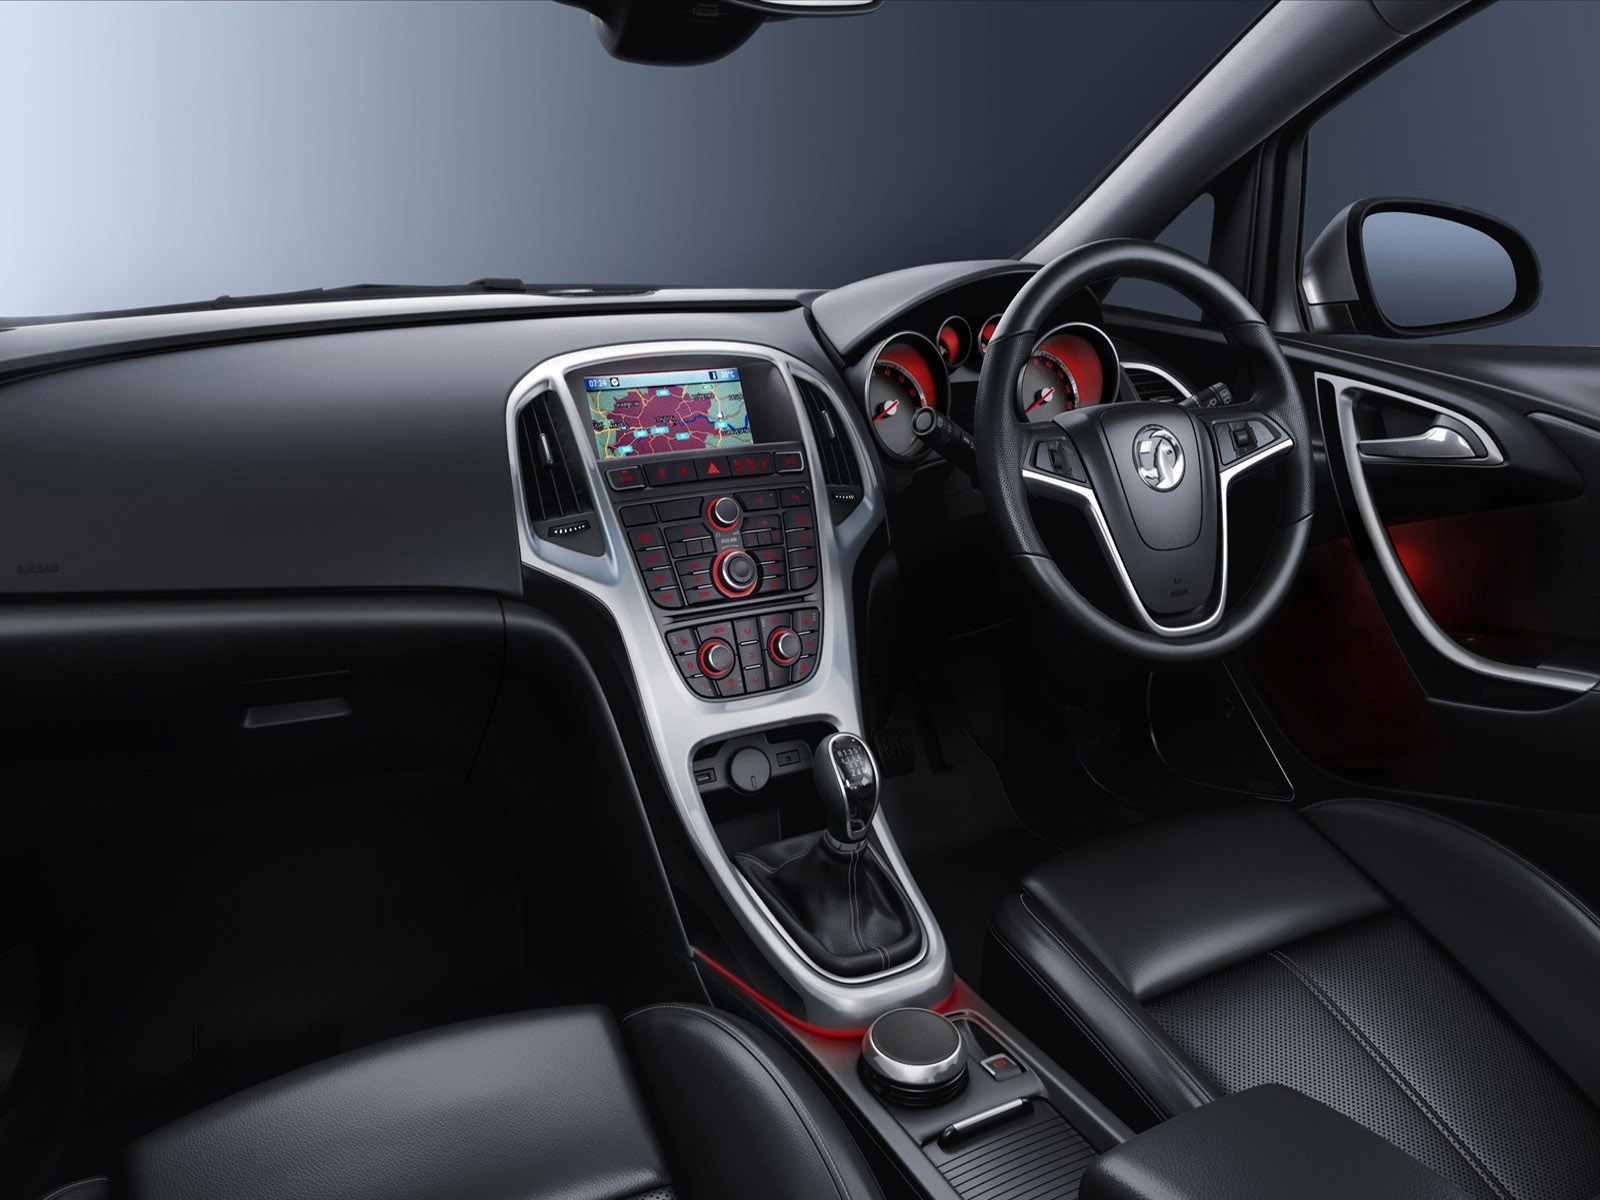 download Vauxhall Astra Interior Hd Wallpaper